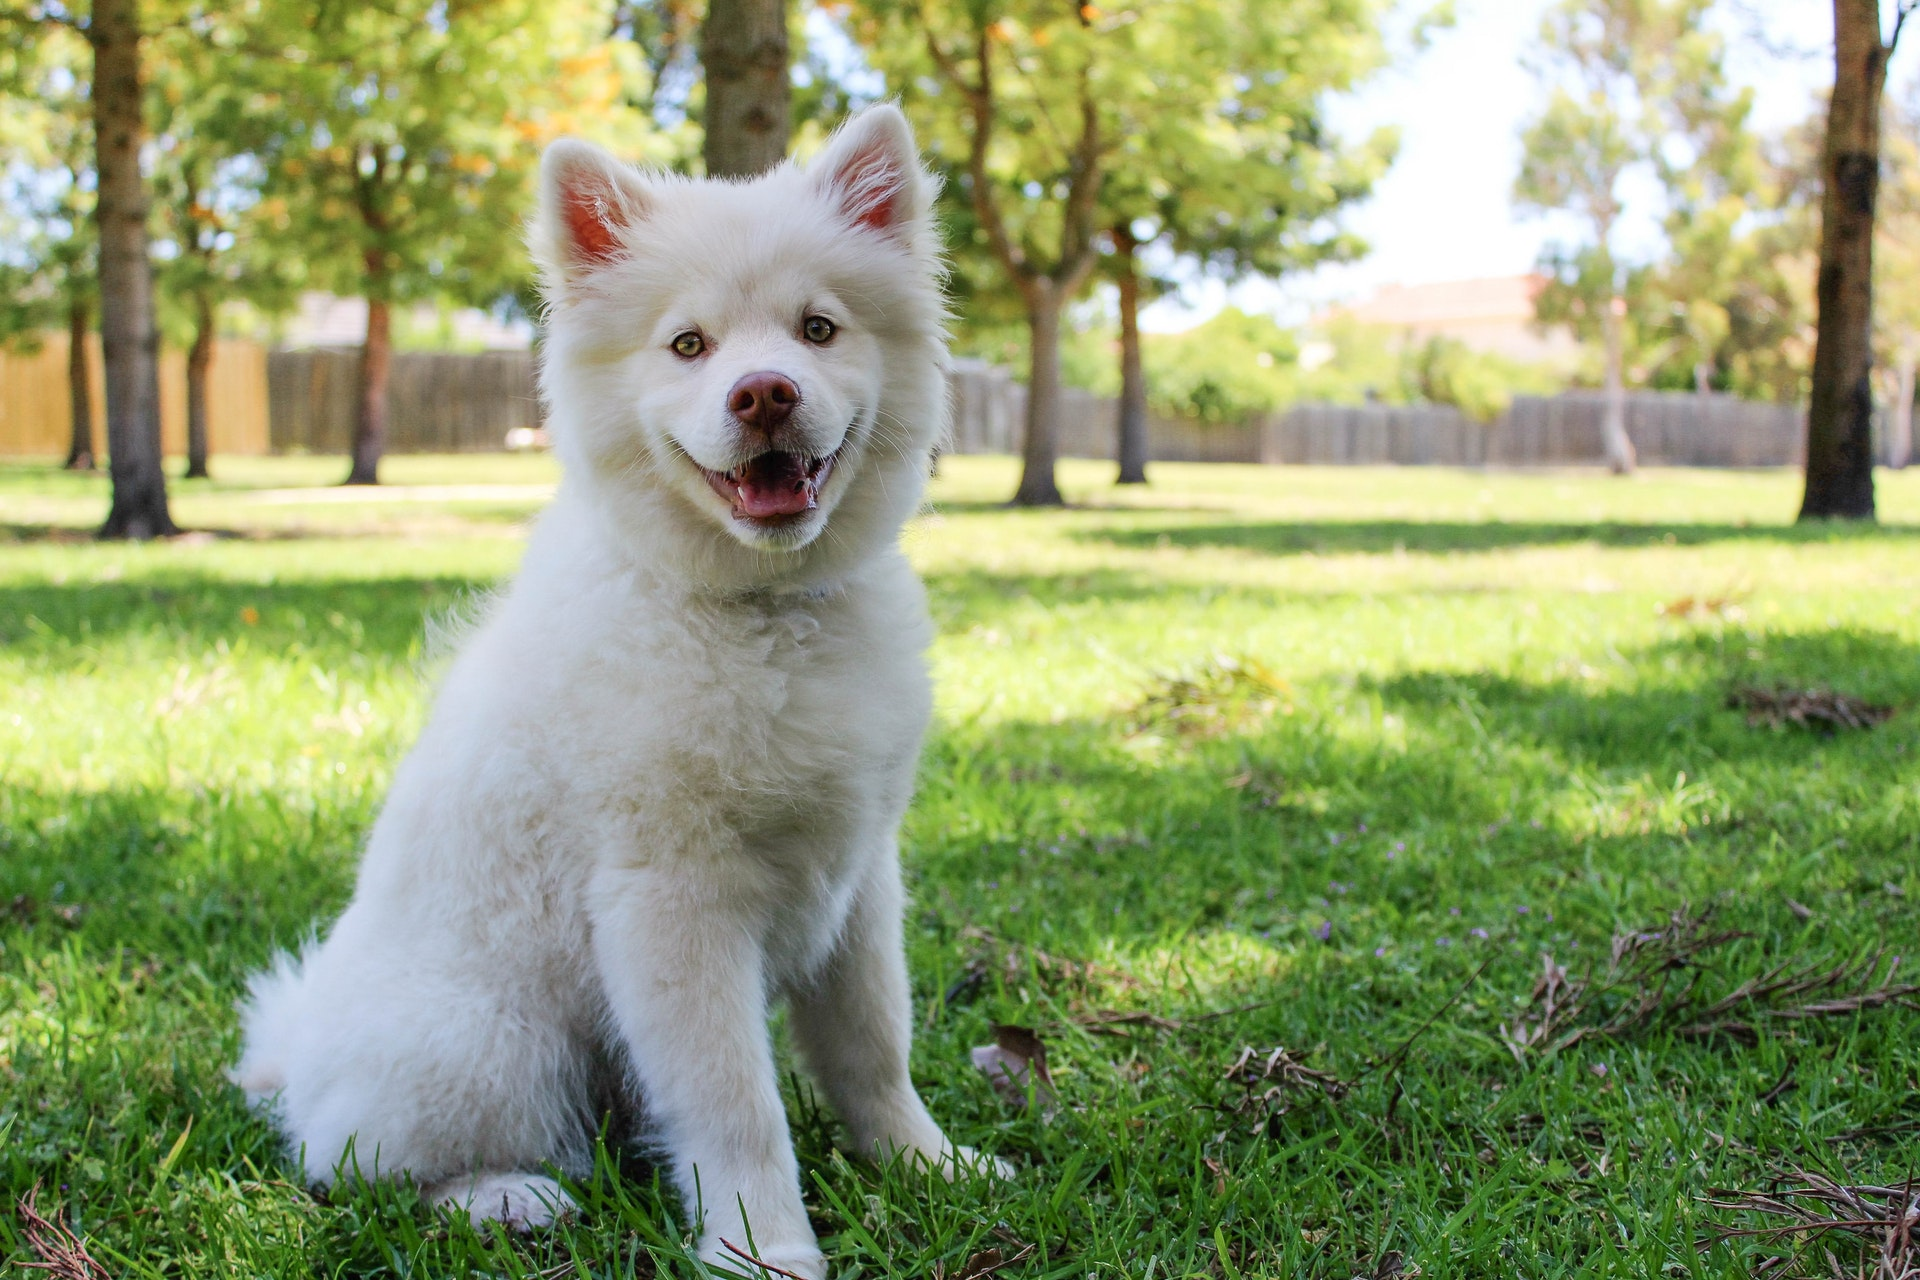 a fluffy white dog sitting outside